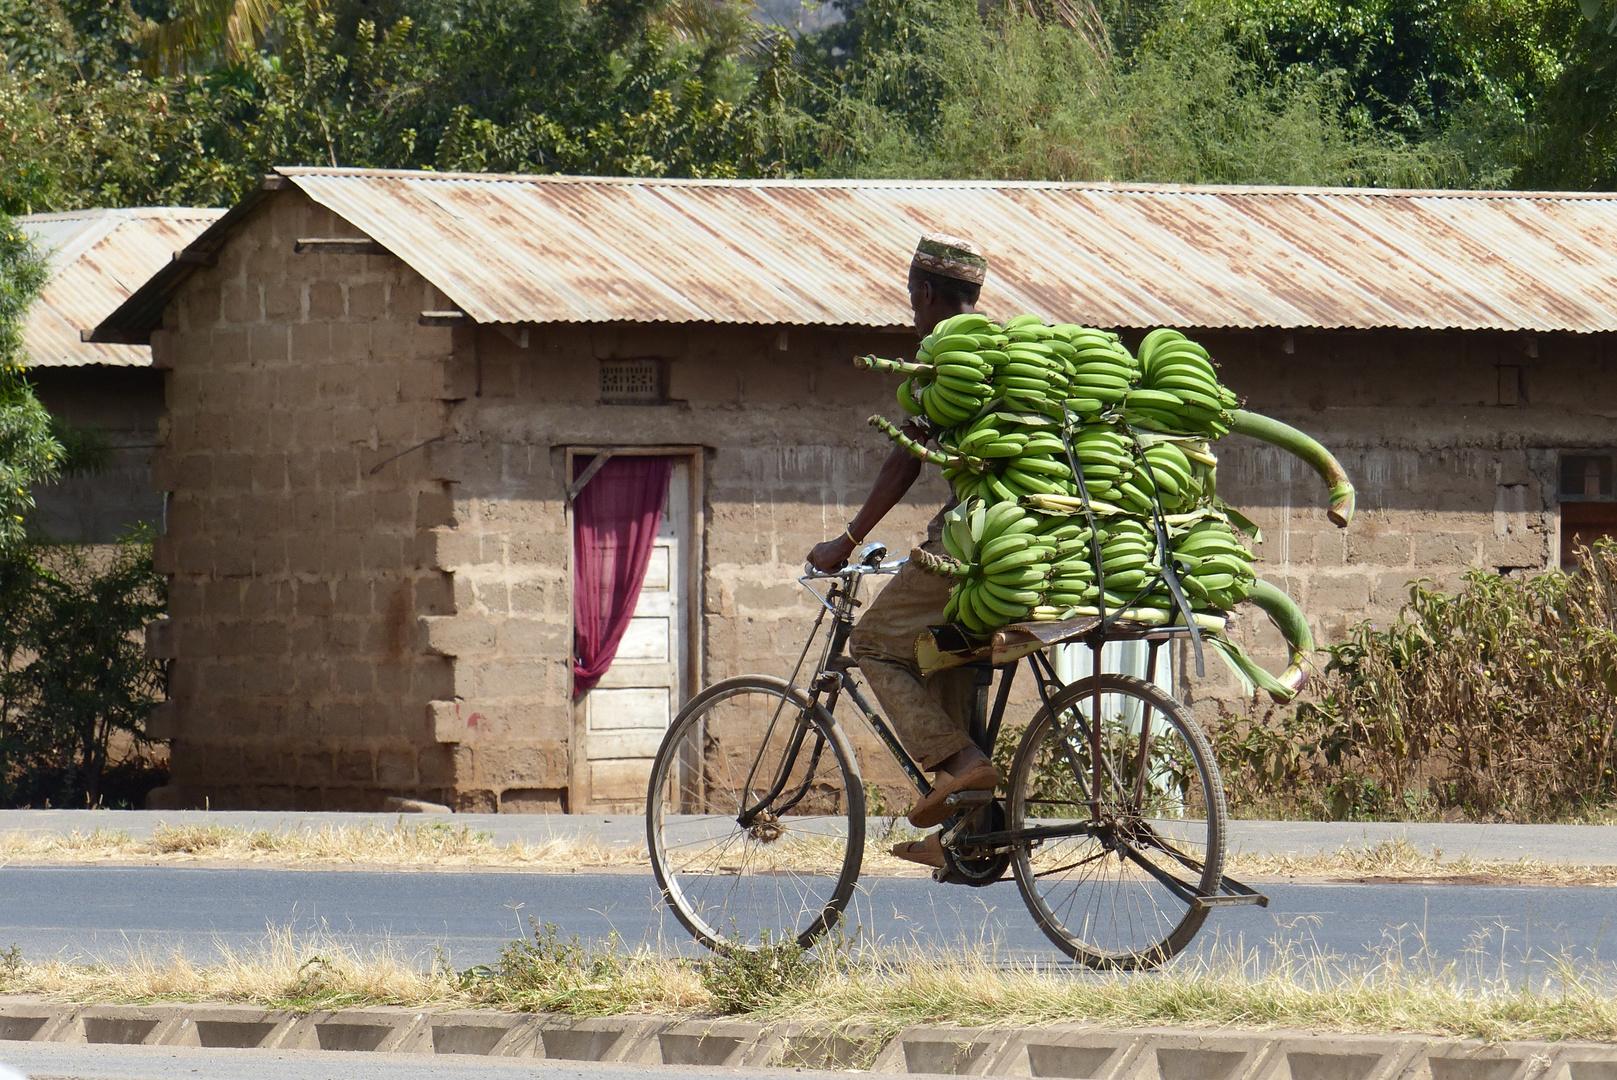 Bananenernte in Tansania